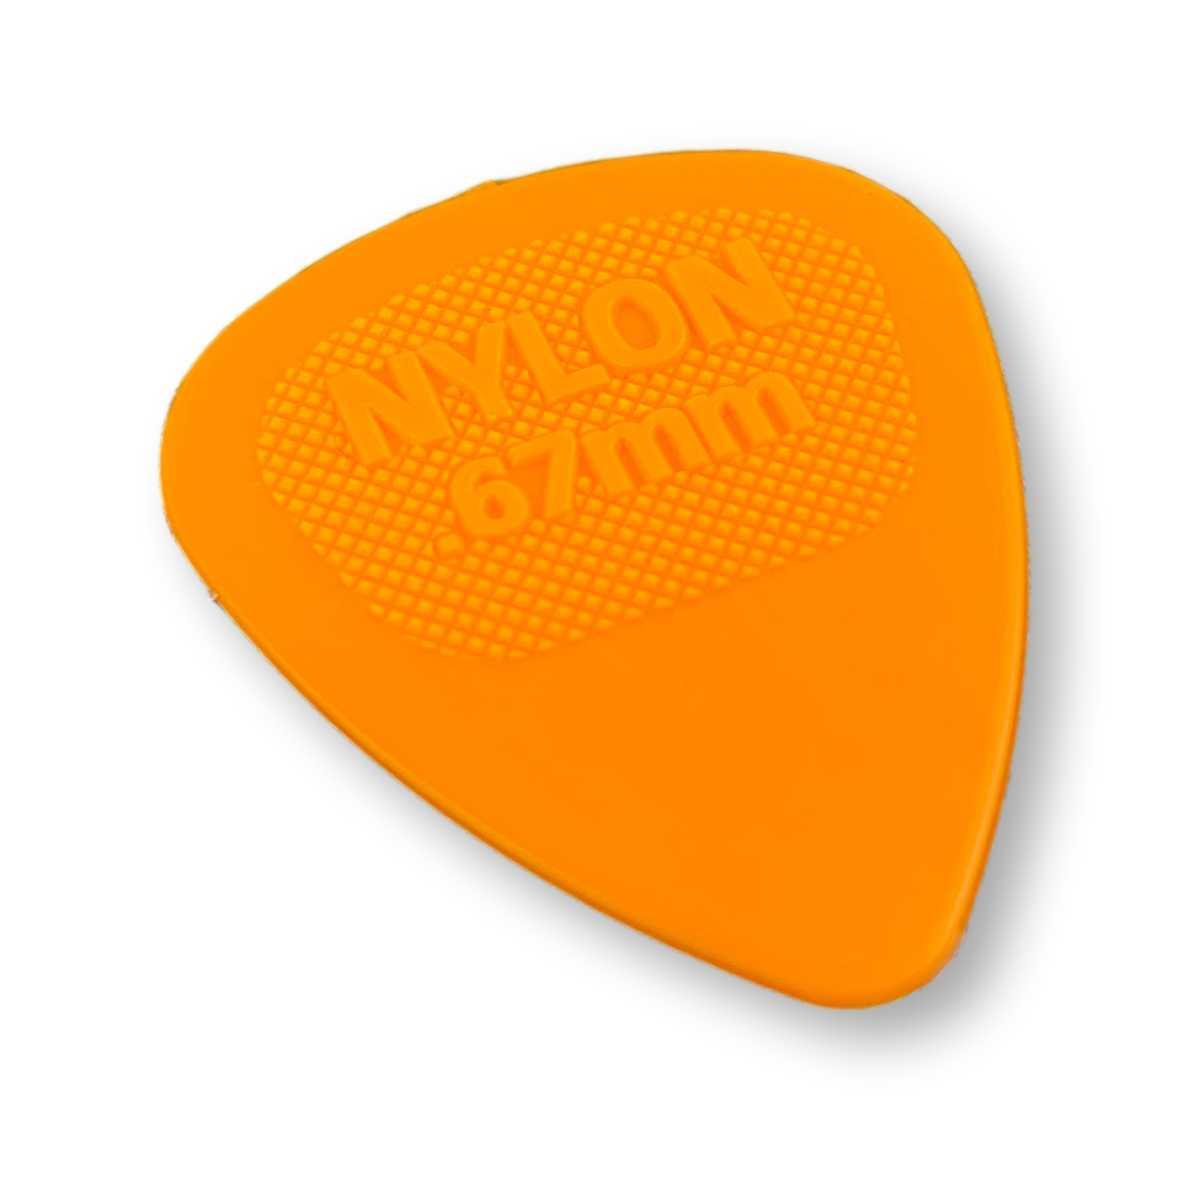 Palheta Dunlop 0.67 mm Nylon